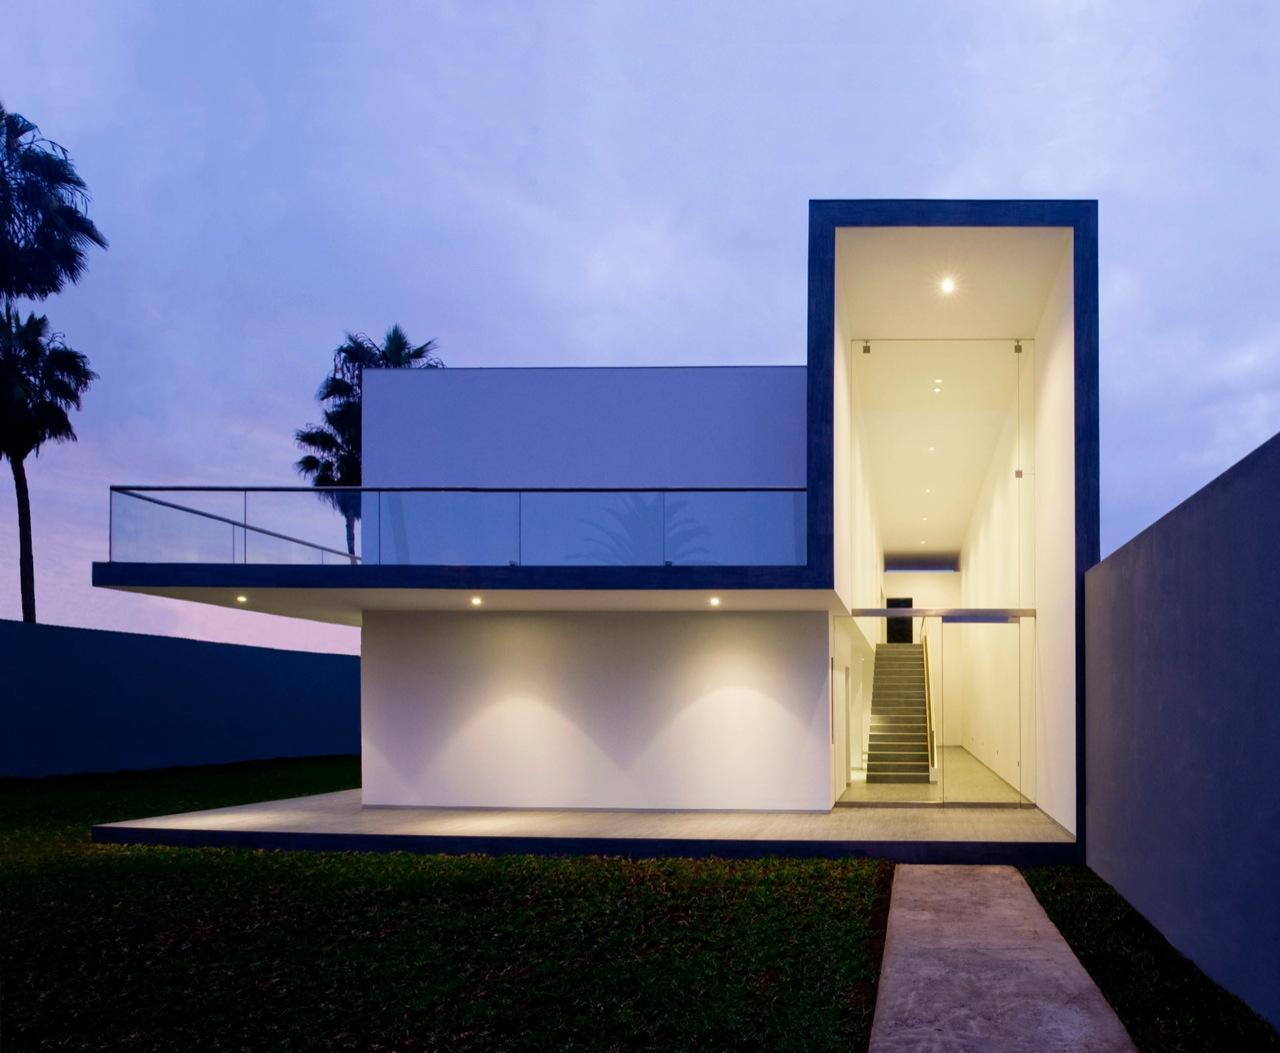 House in la encantada javier artadi archdaily for Imagenes de arquitectura minimalista